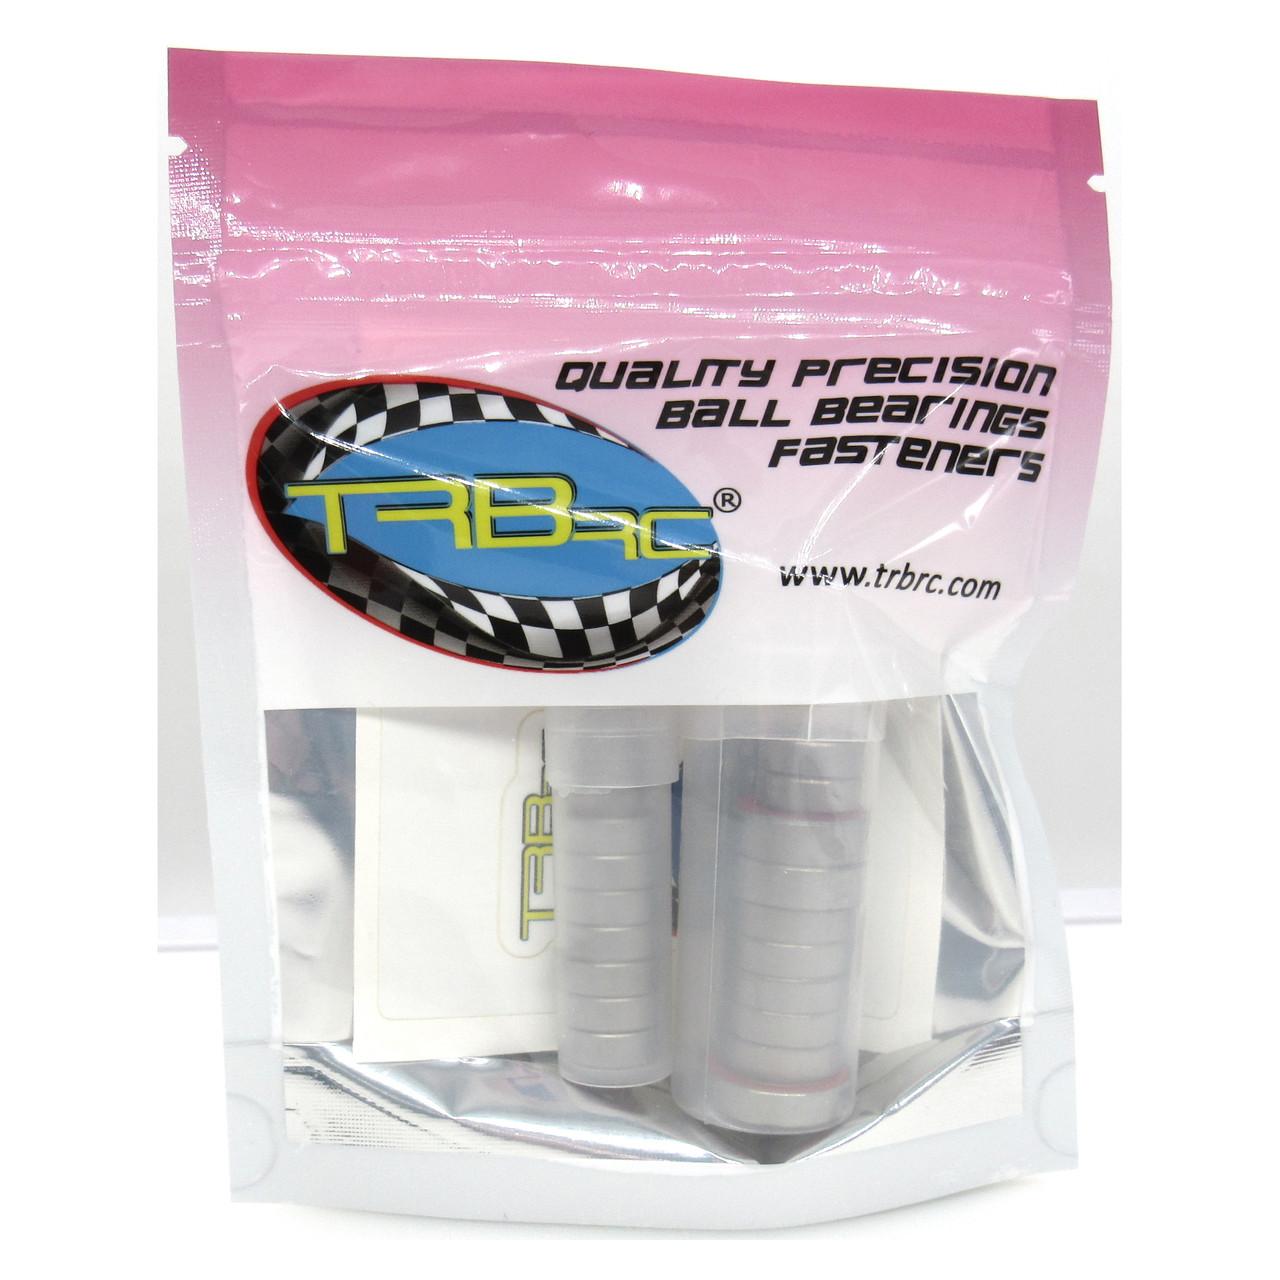 21 Traxxas Slash Rustler 4x4 VXL TRB RC Ceramic Ball Bearing Kit